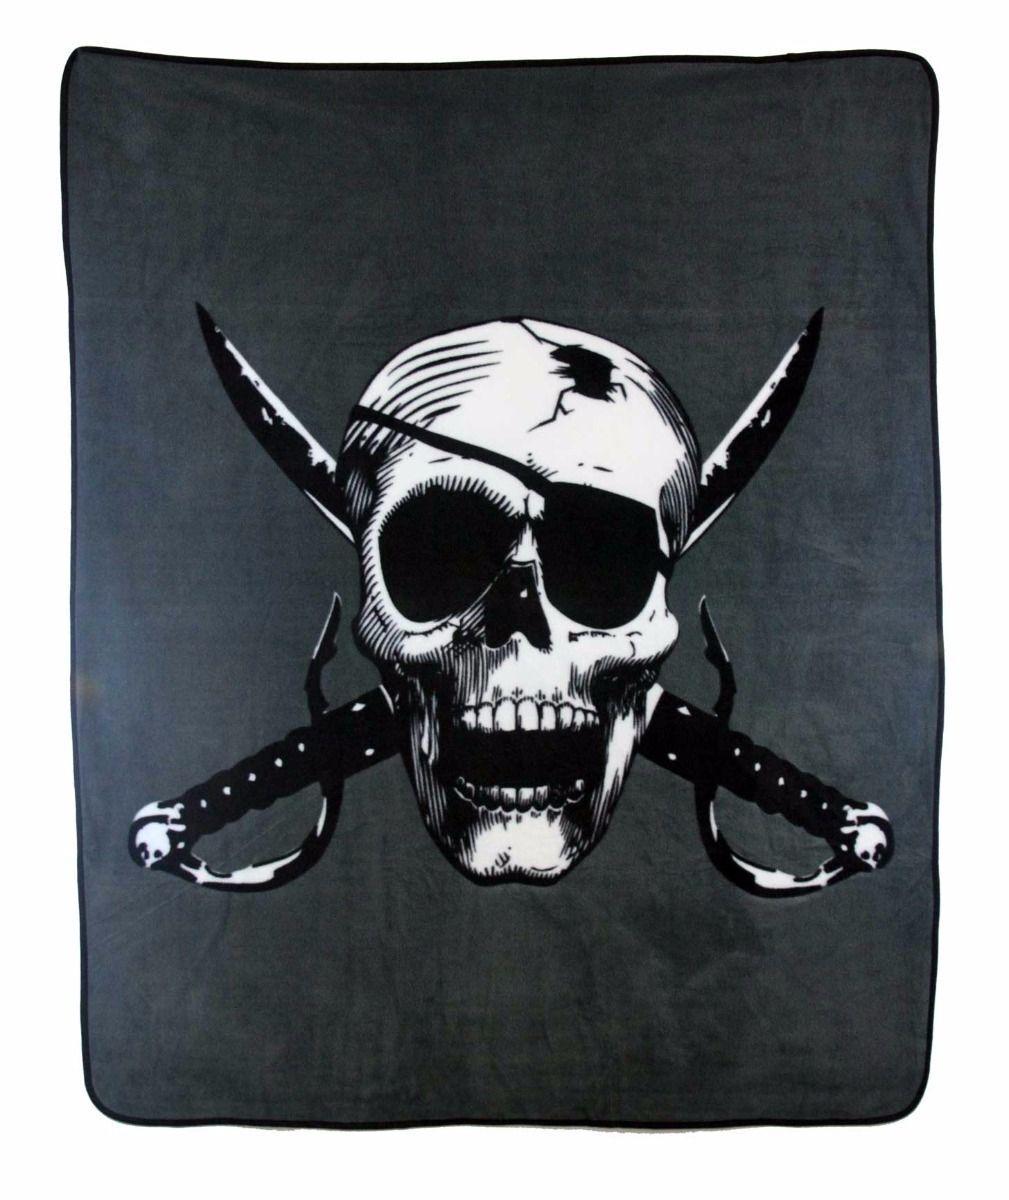 Wholesale ( 6 ) Pirate Skull Cutlass 50x60 Polar Fleece Blanket Throw Plush